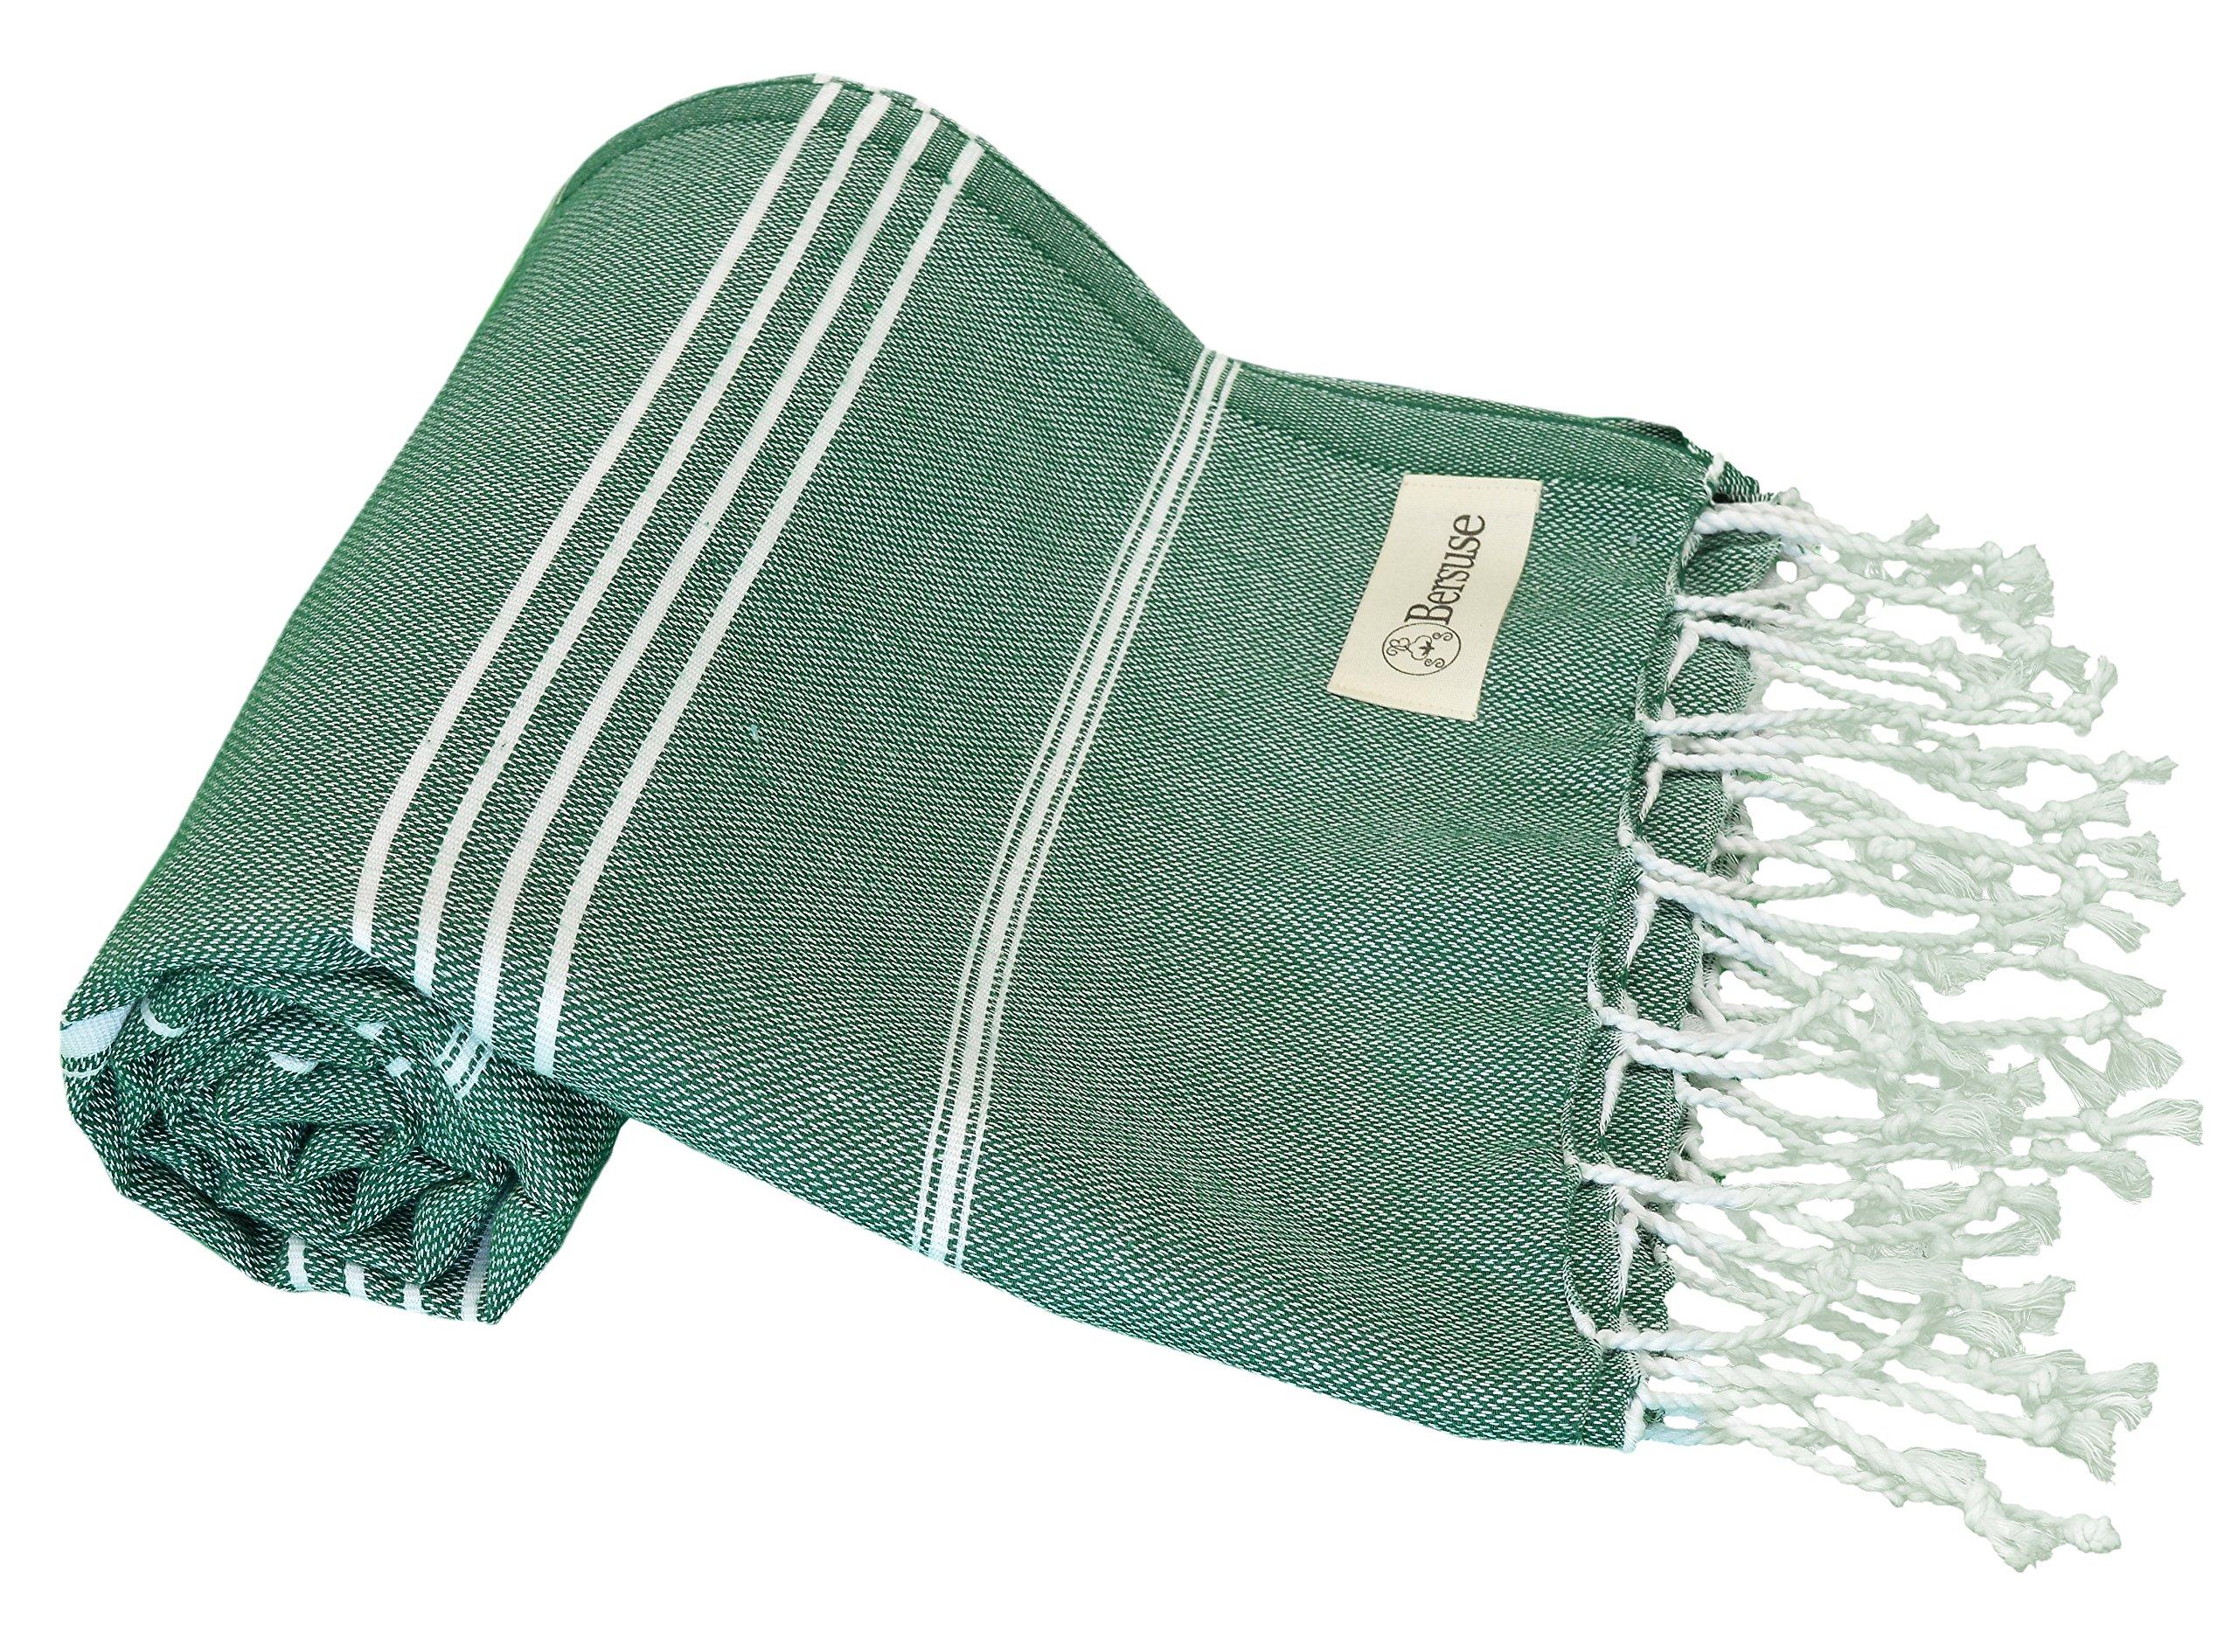 Bersuse 100% Cotton - Anatolia Turkish Towel - Bath Beach Fouta Peshtemal - Classic Striped Pestemal - 37X70 Inches, Forest Green